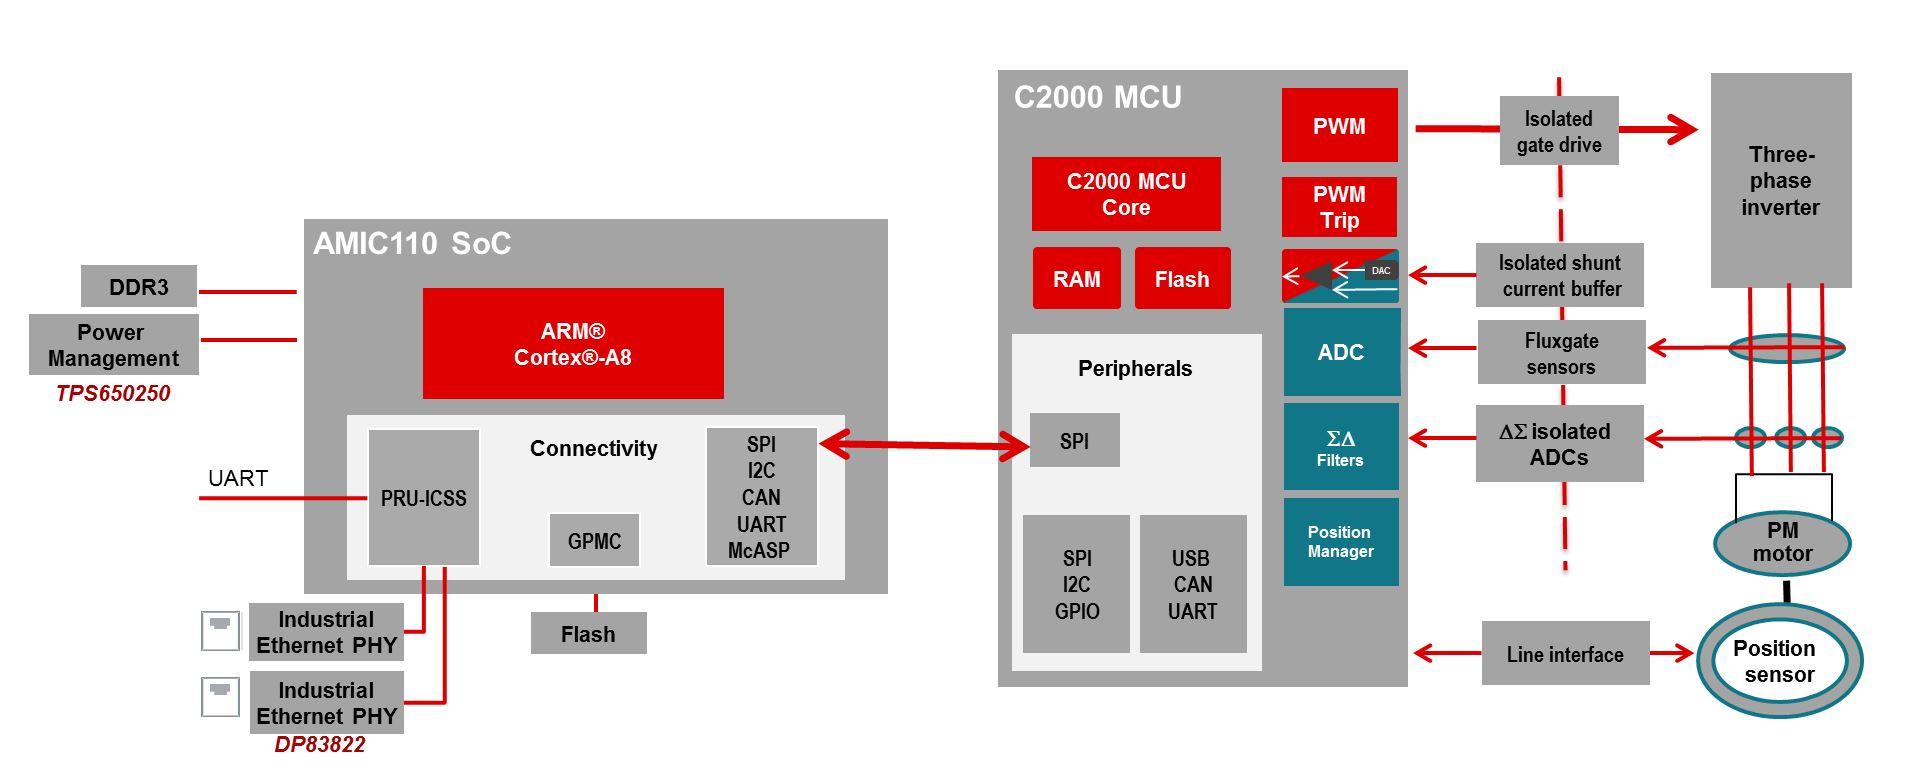 Texas Instruments Announces Amic110 Sitara Industrial